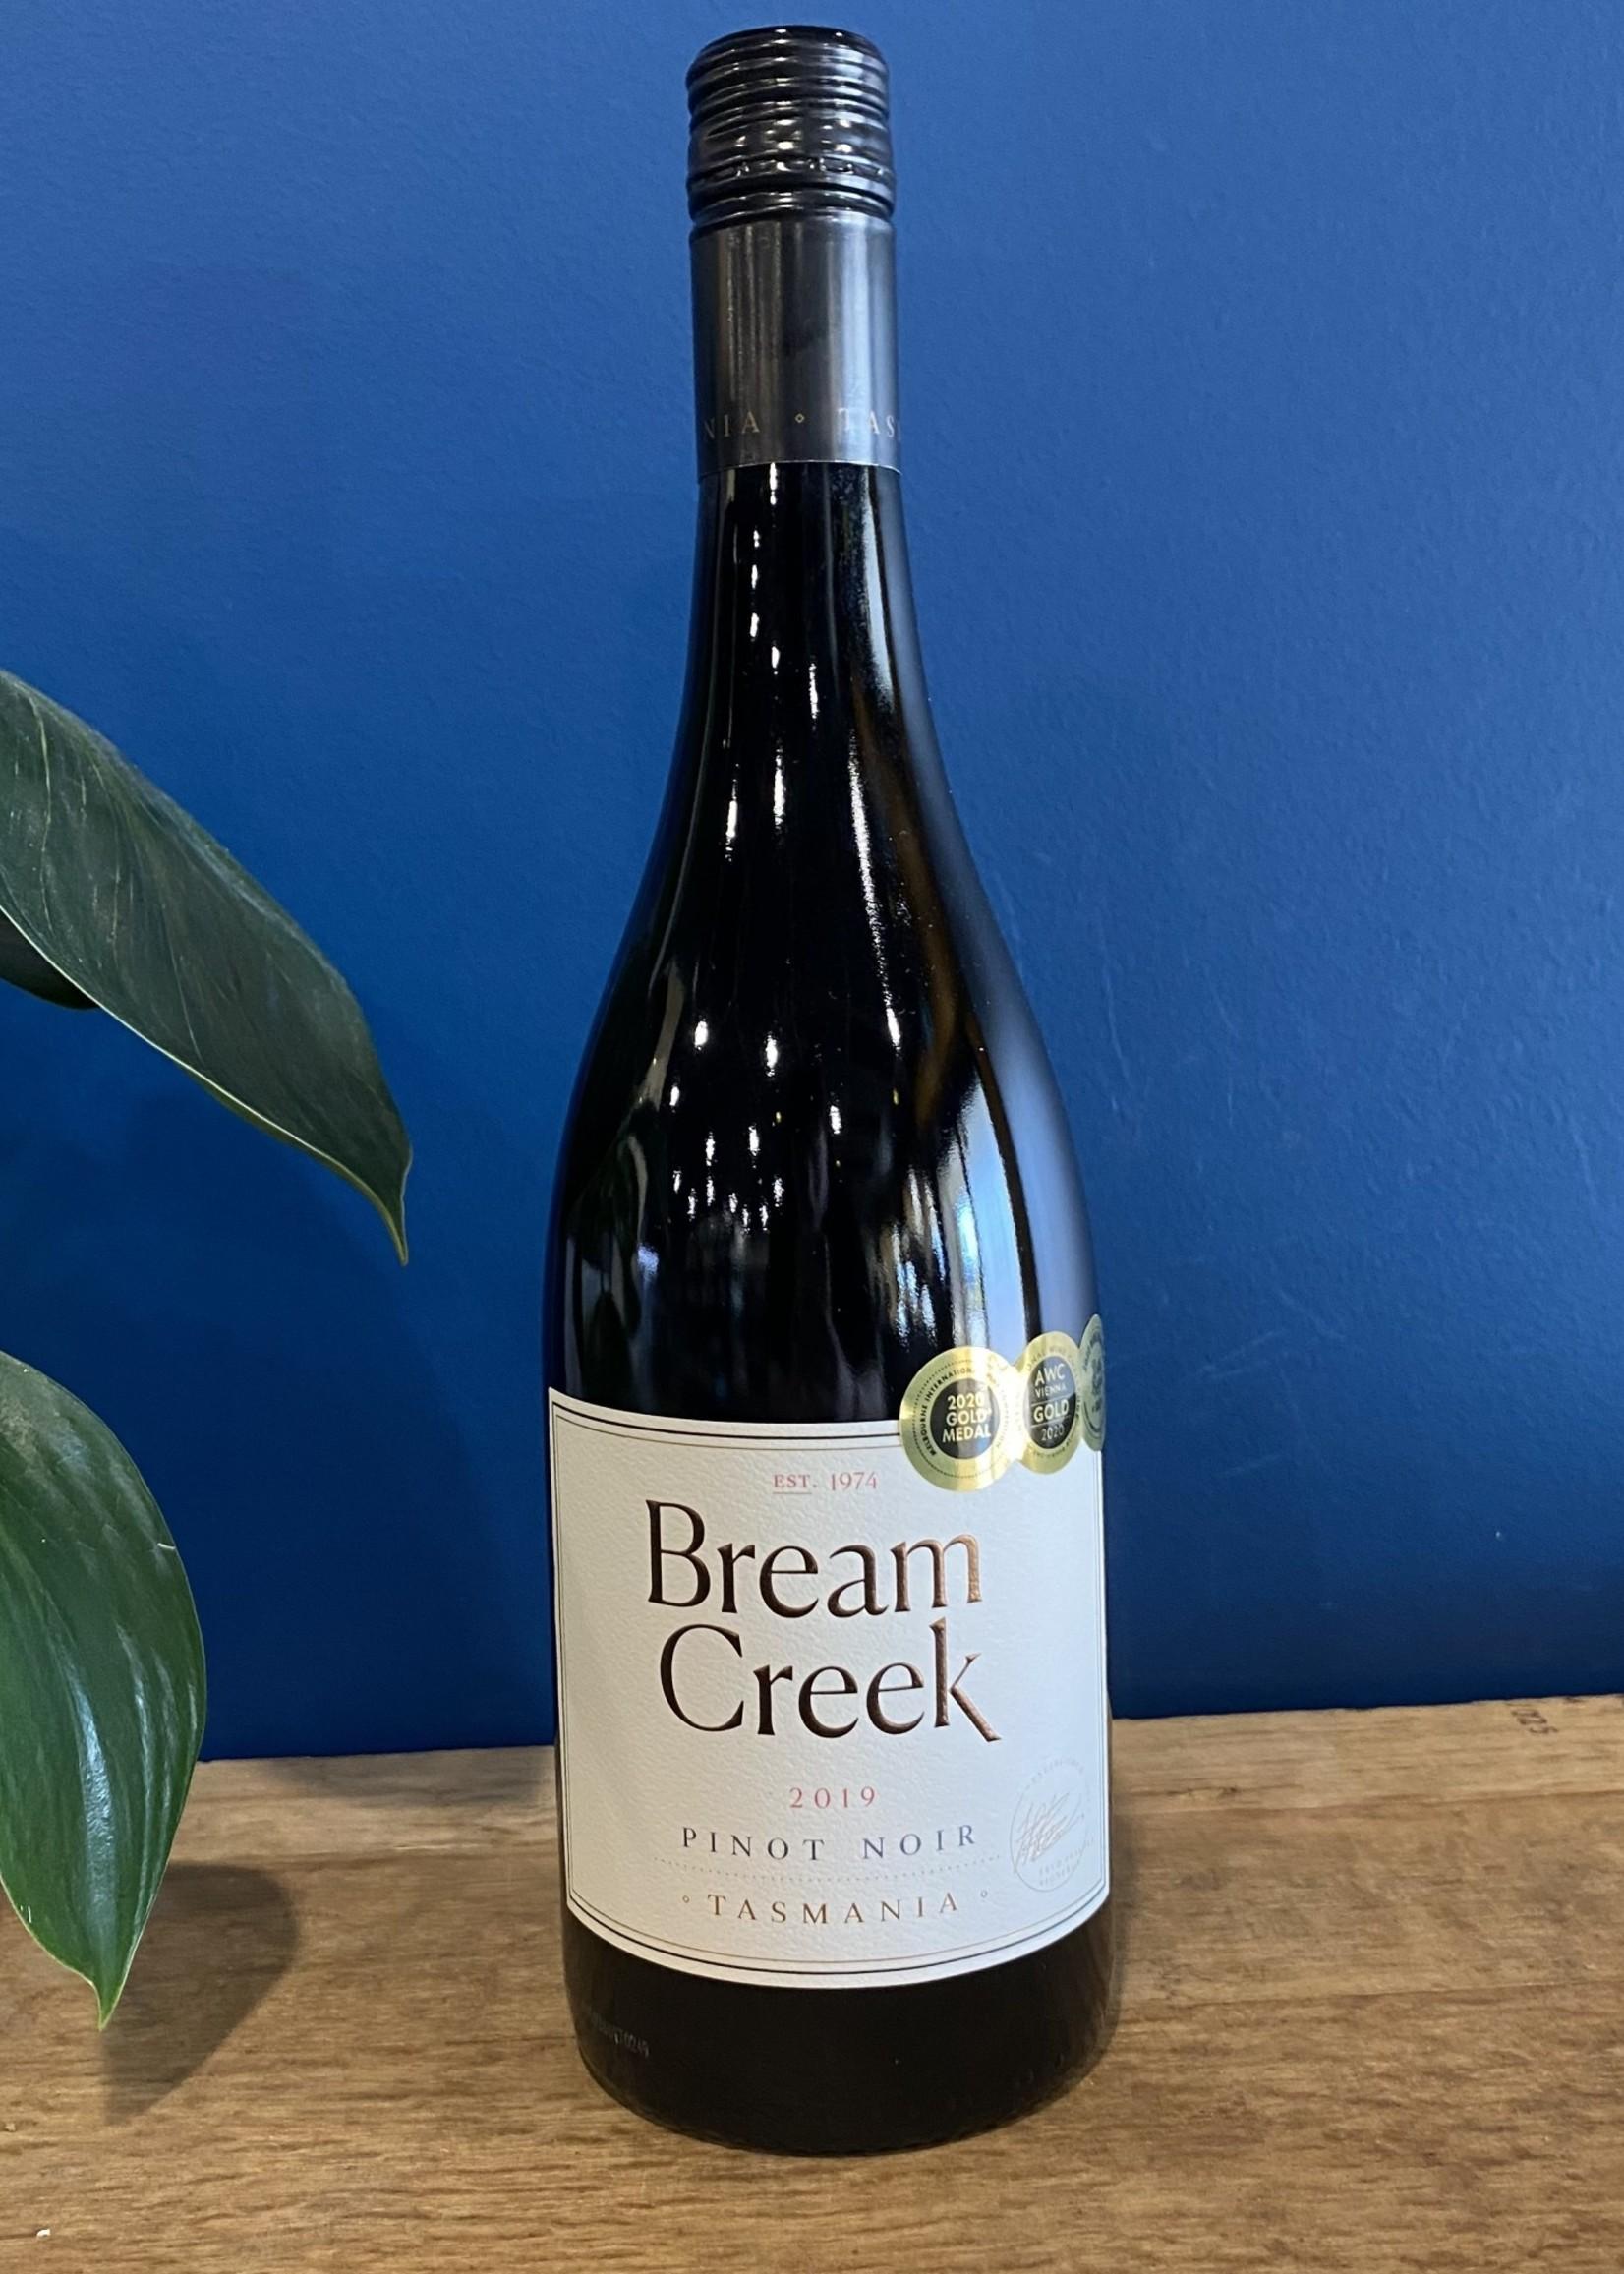 Bream Creek Bream Creek Pinot Noir